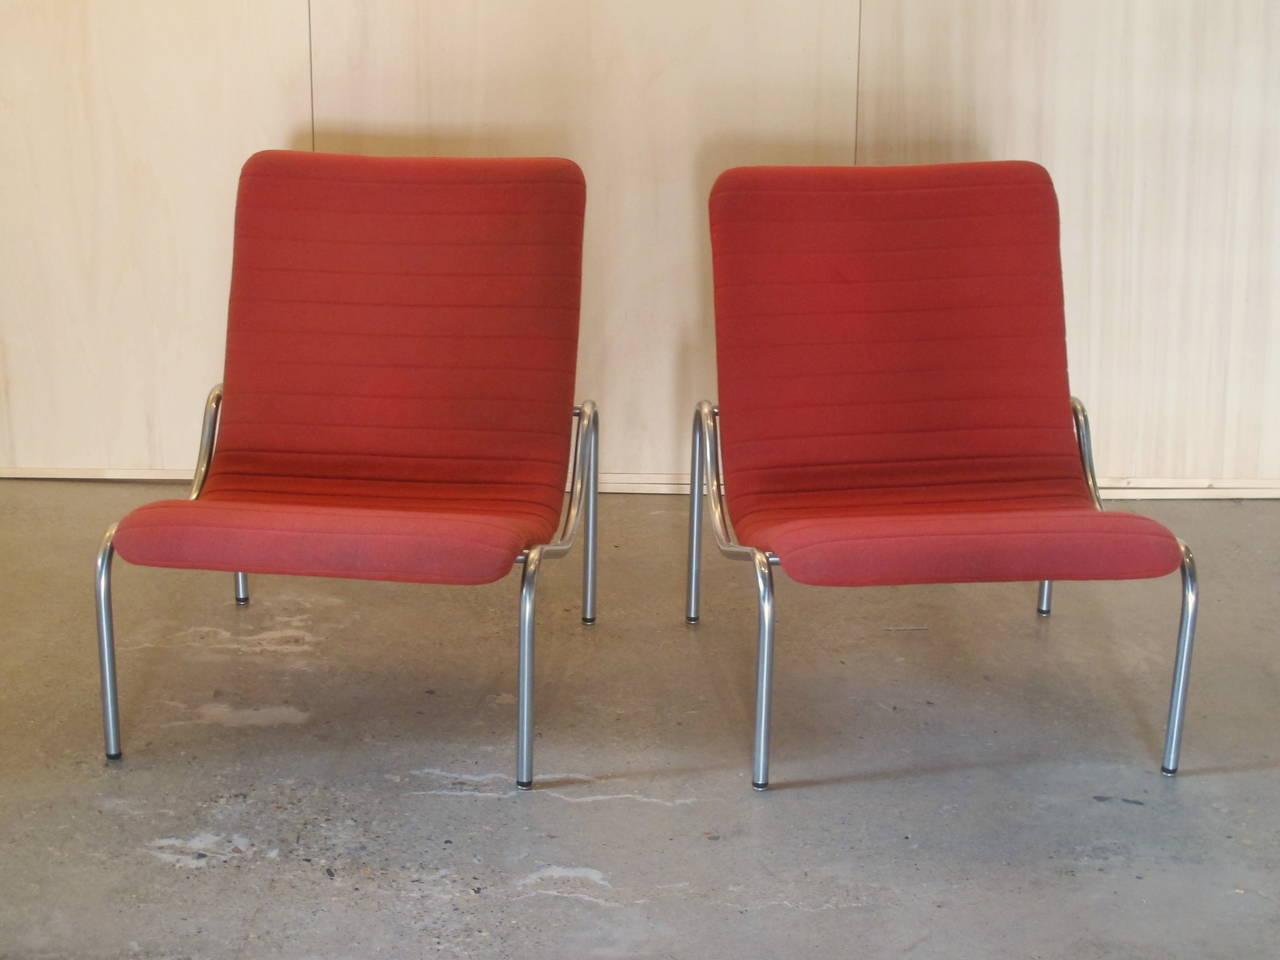 Stoel Metalen Frame : Kho liang ie stoel met verchroomd metalen frame model 703 ontwerp